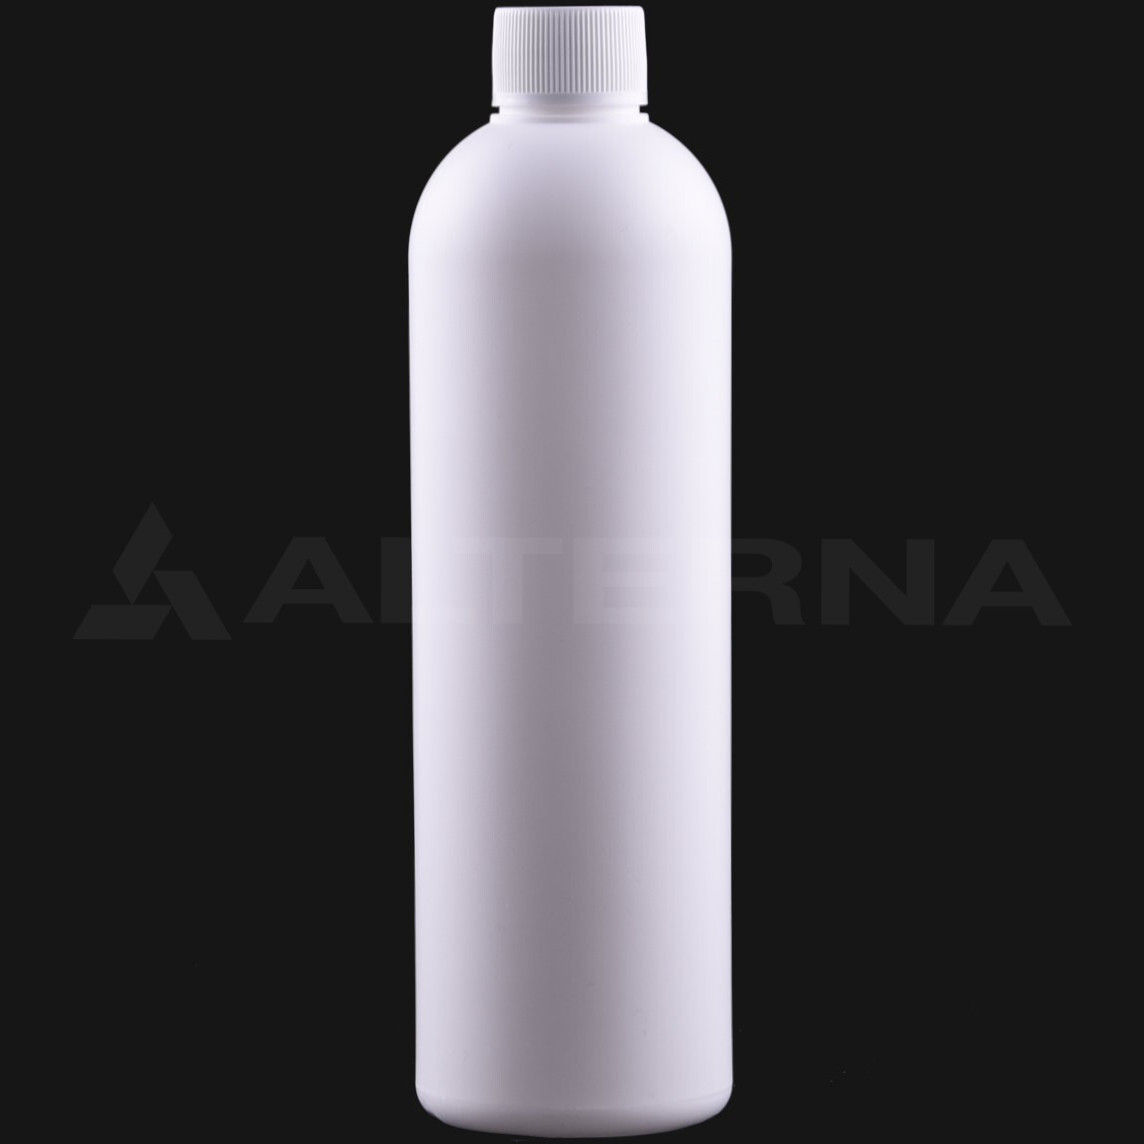 400 ml HDPE Bottle with 24 mm Foam Seal Cap